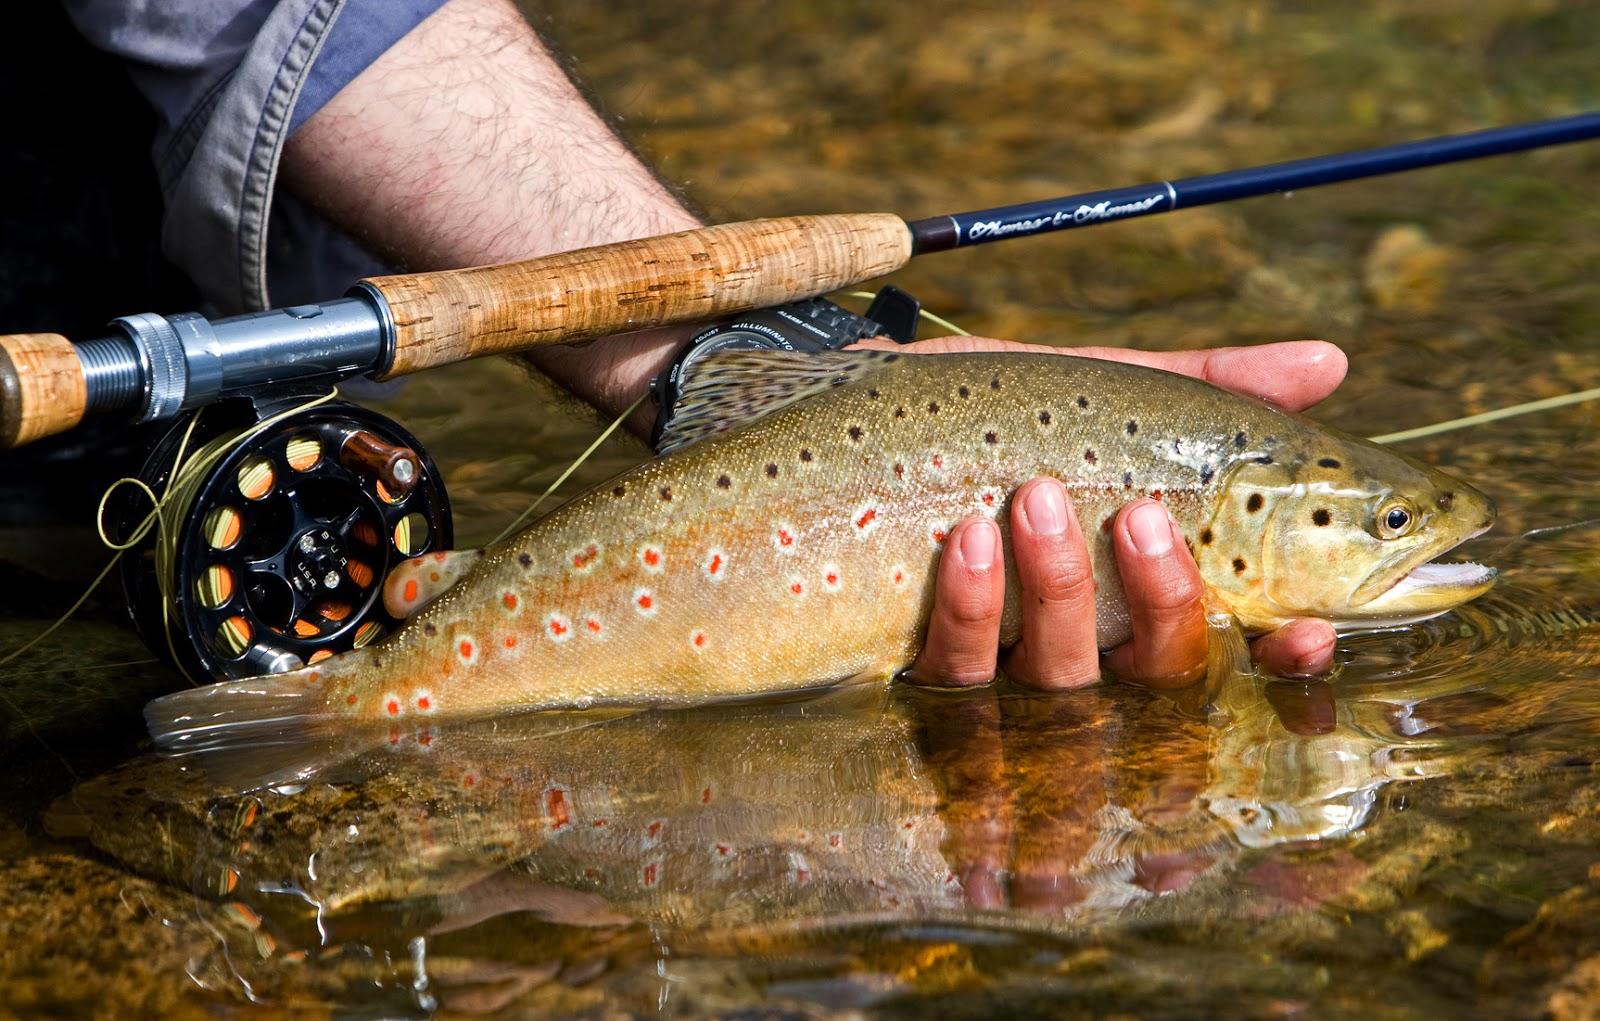 idaho fly fishers | idaho montana fishing | fly fishing trips, Fly Fishing Bait